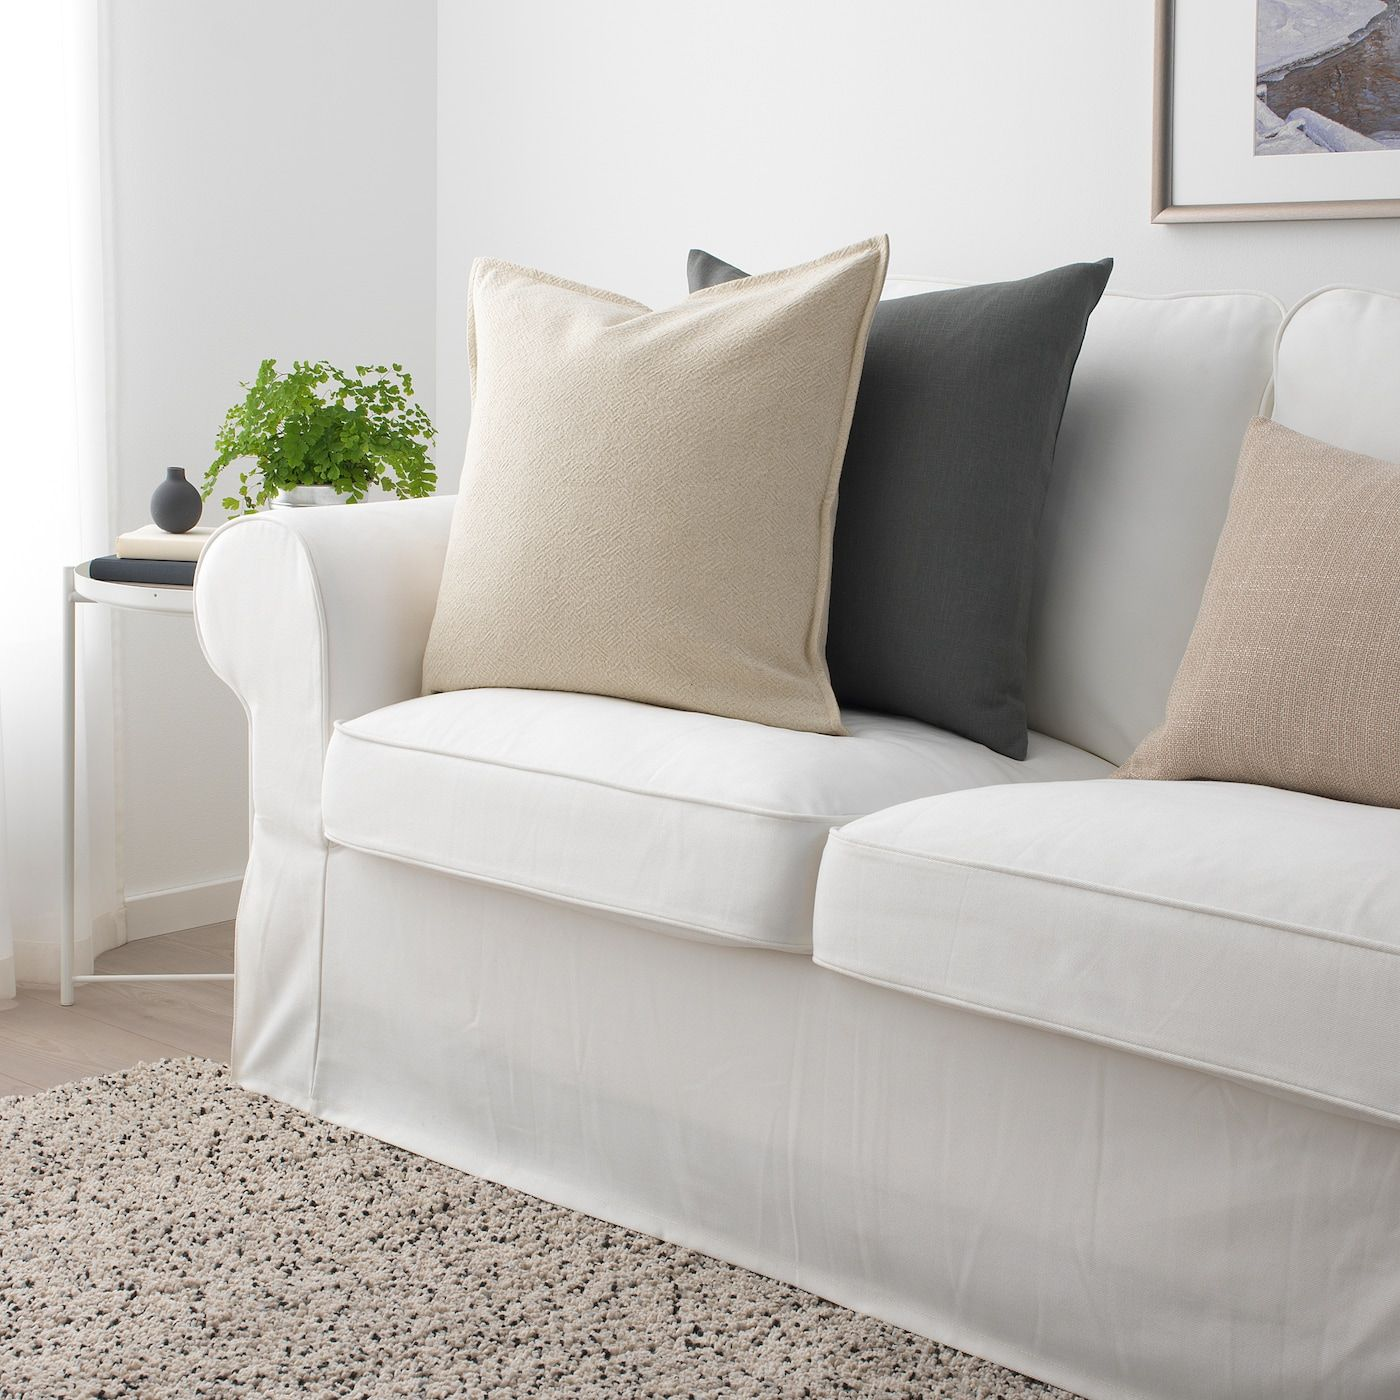 Kissenbezug Baumwolle Leinen Kissenbezug Dekorative Square Home Throw Sofa Yd